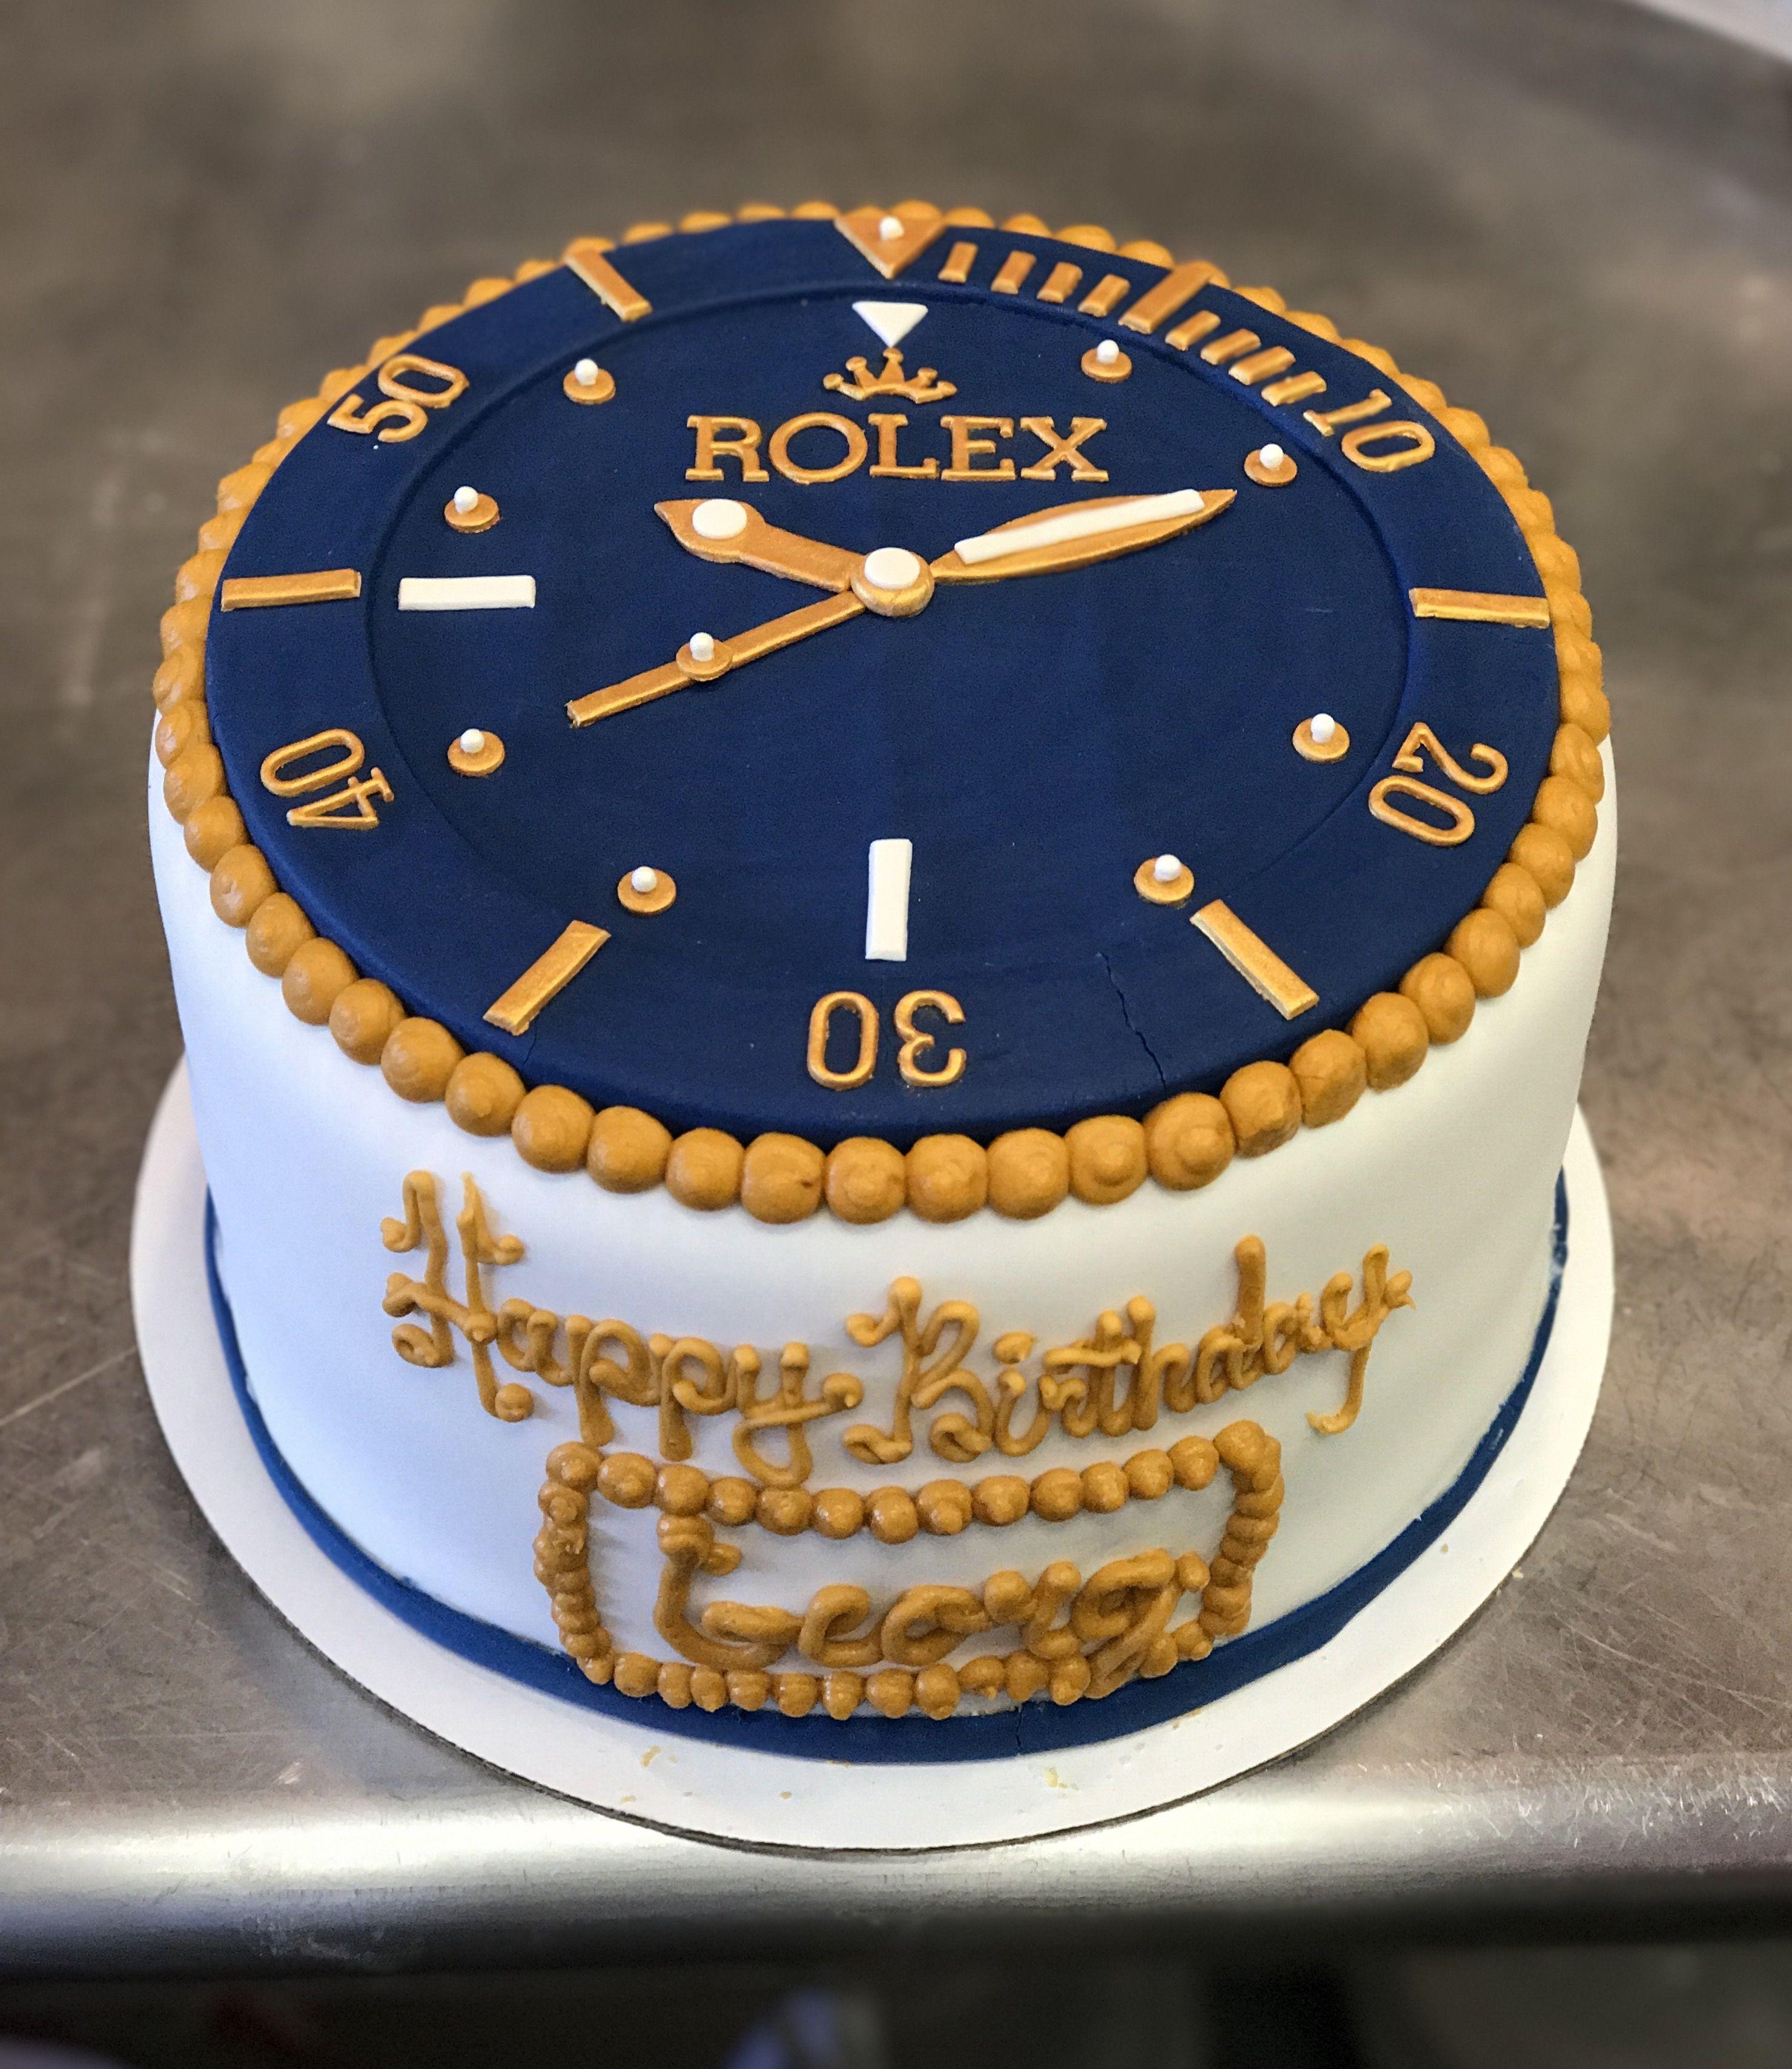 Rolex cake by Frostings Bake Shop Birthday cake